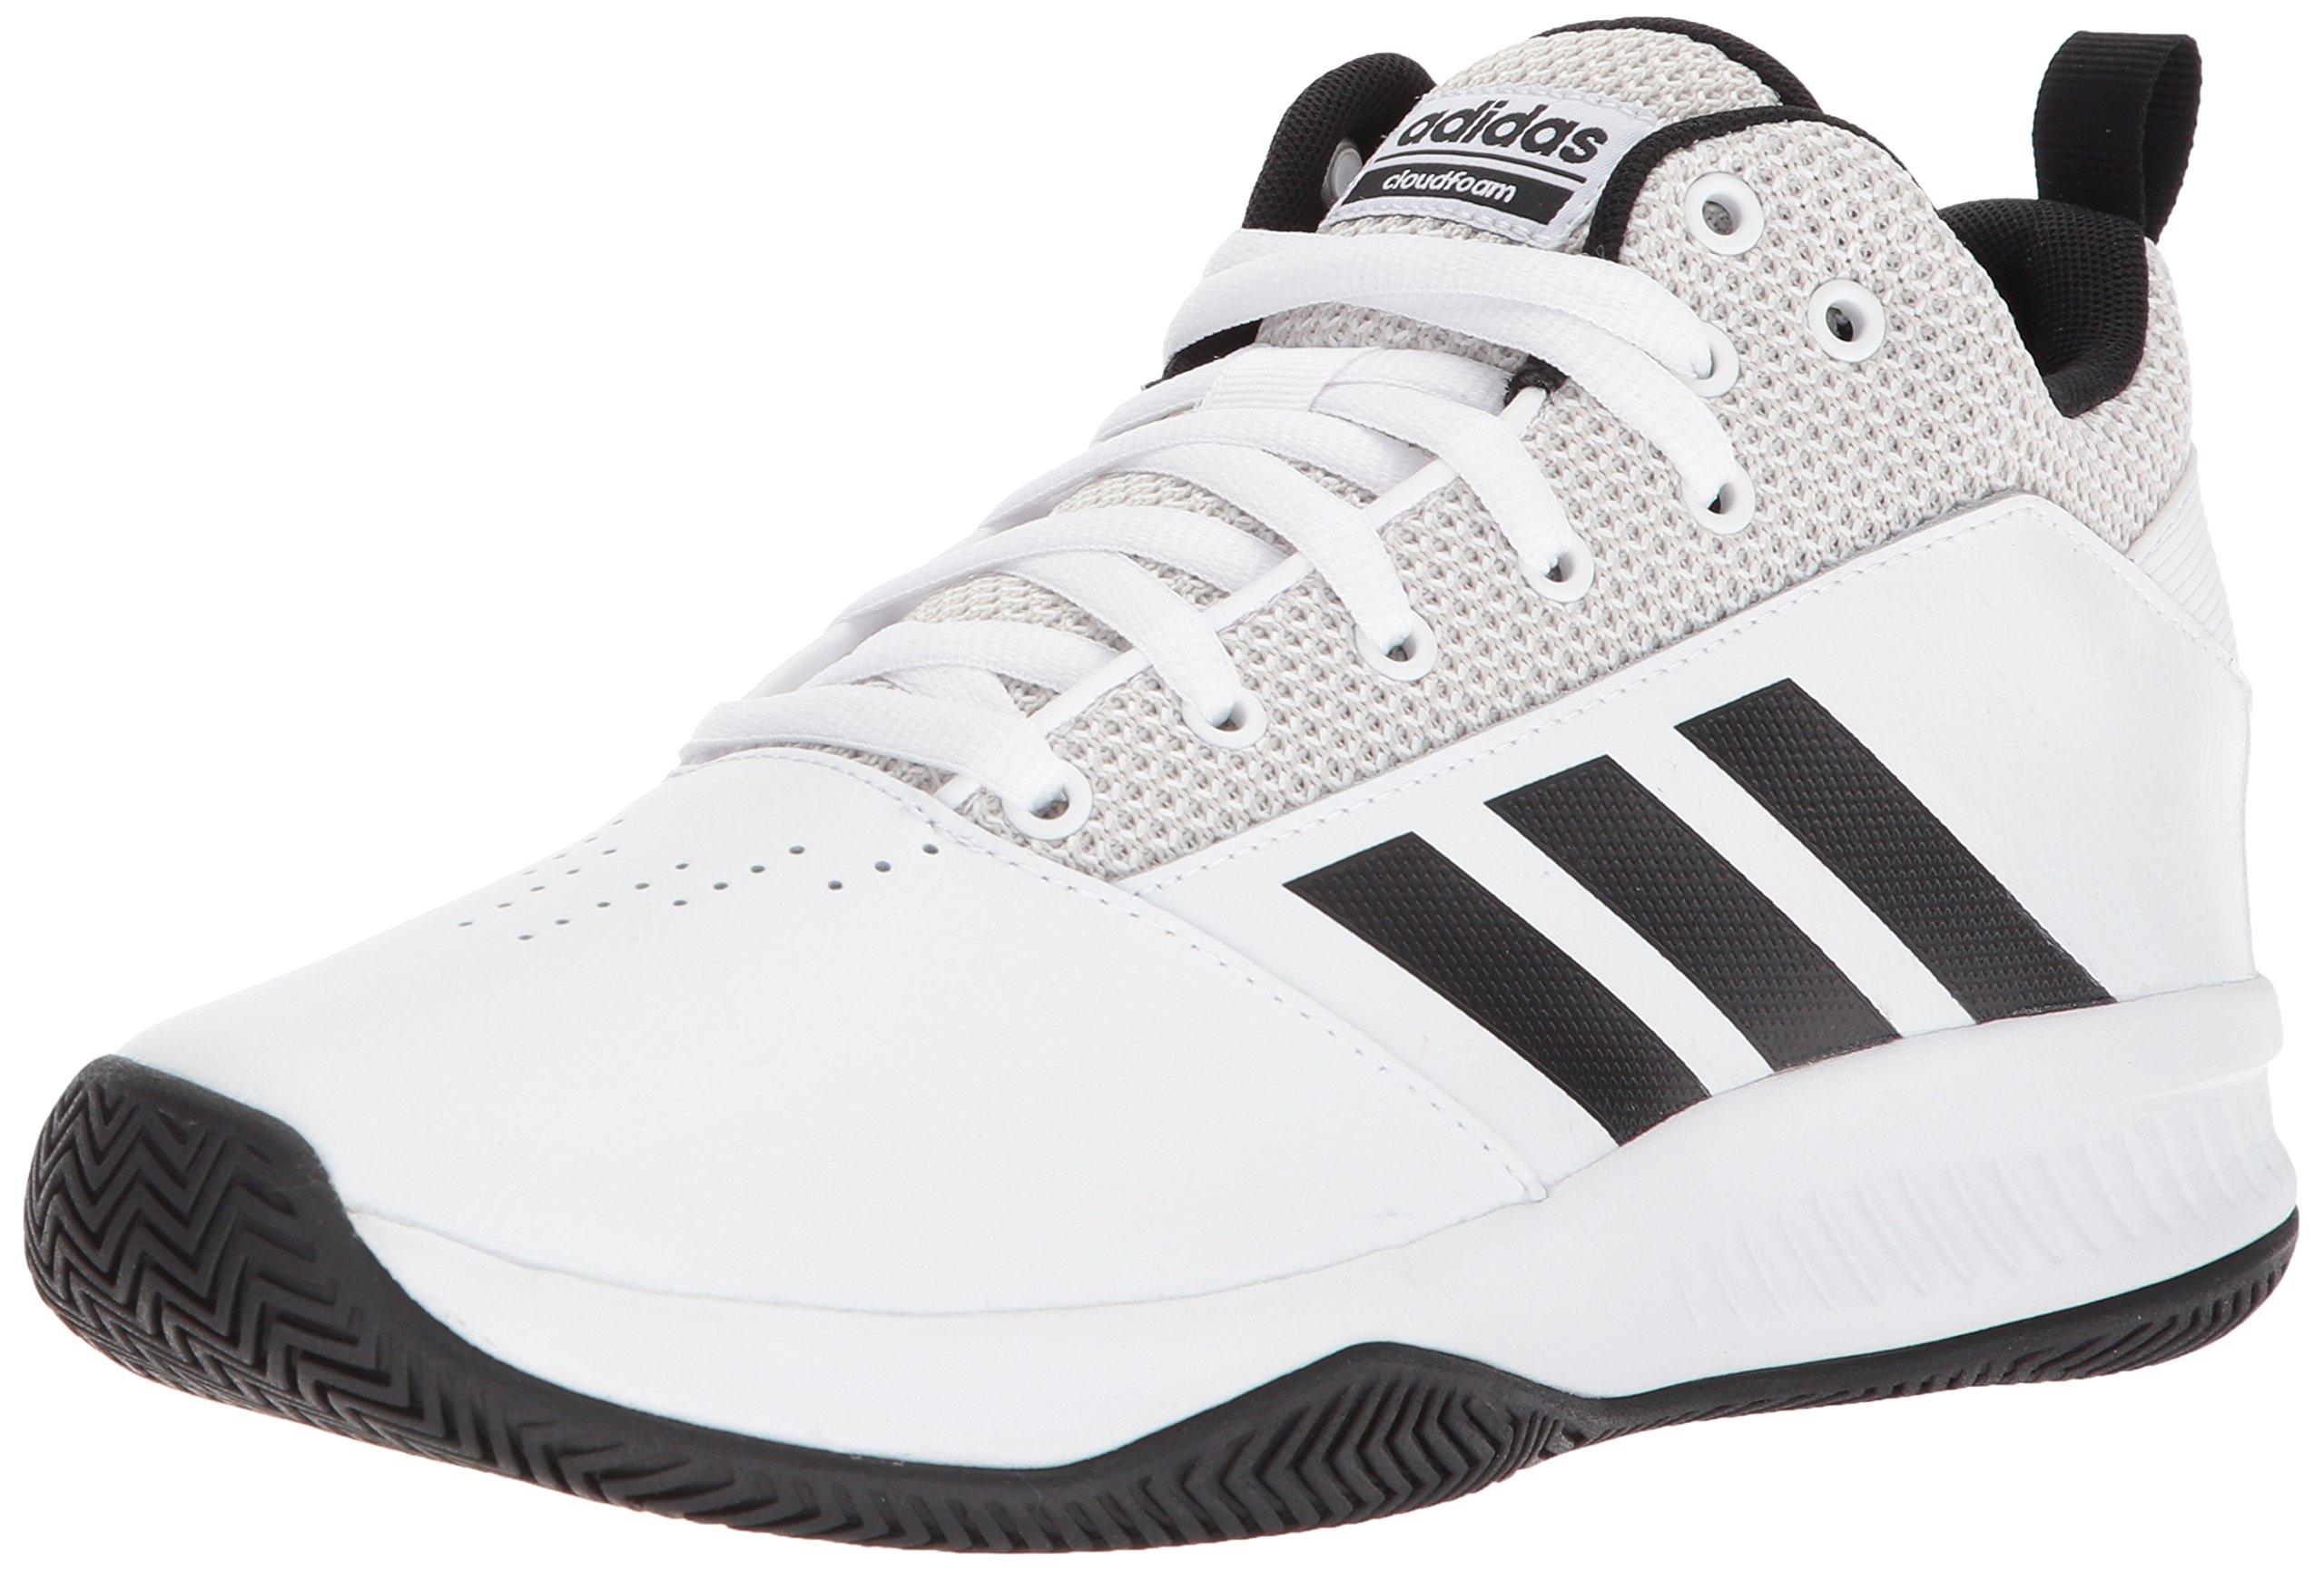 Galleon - Adidas Men s Cf Ilation 2.0 4e c8a501f12